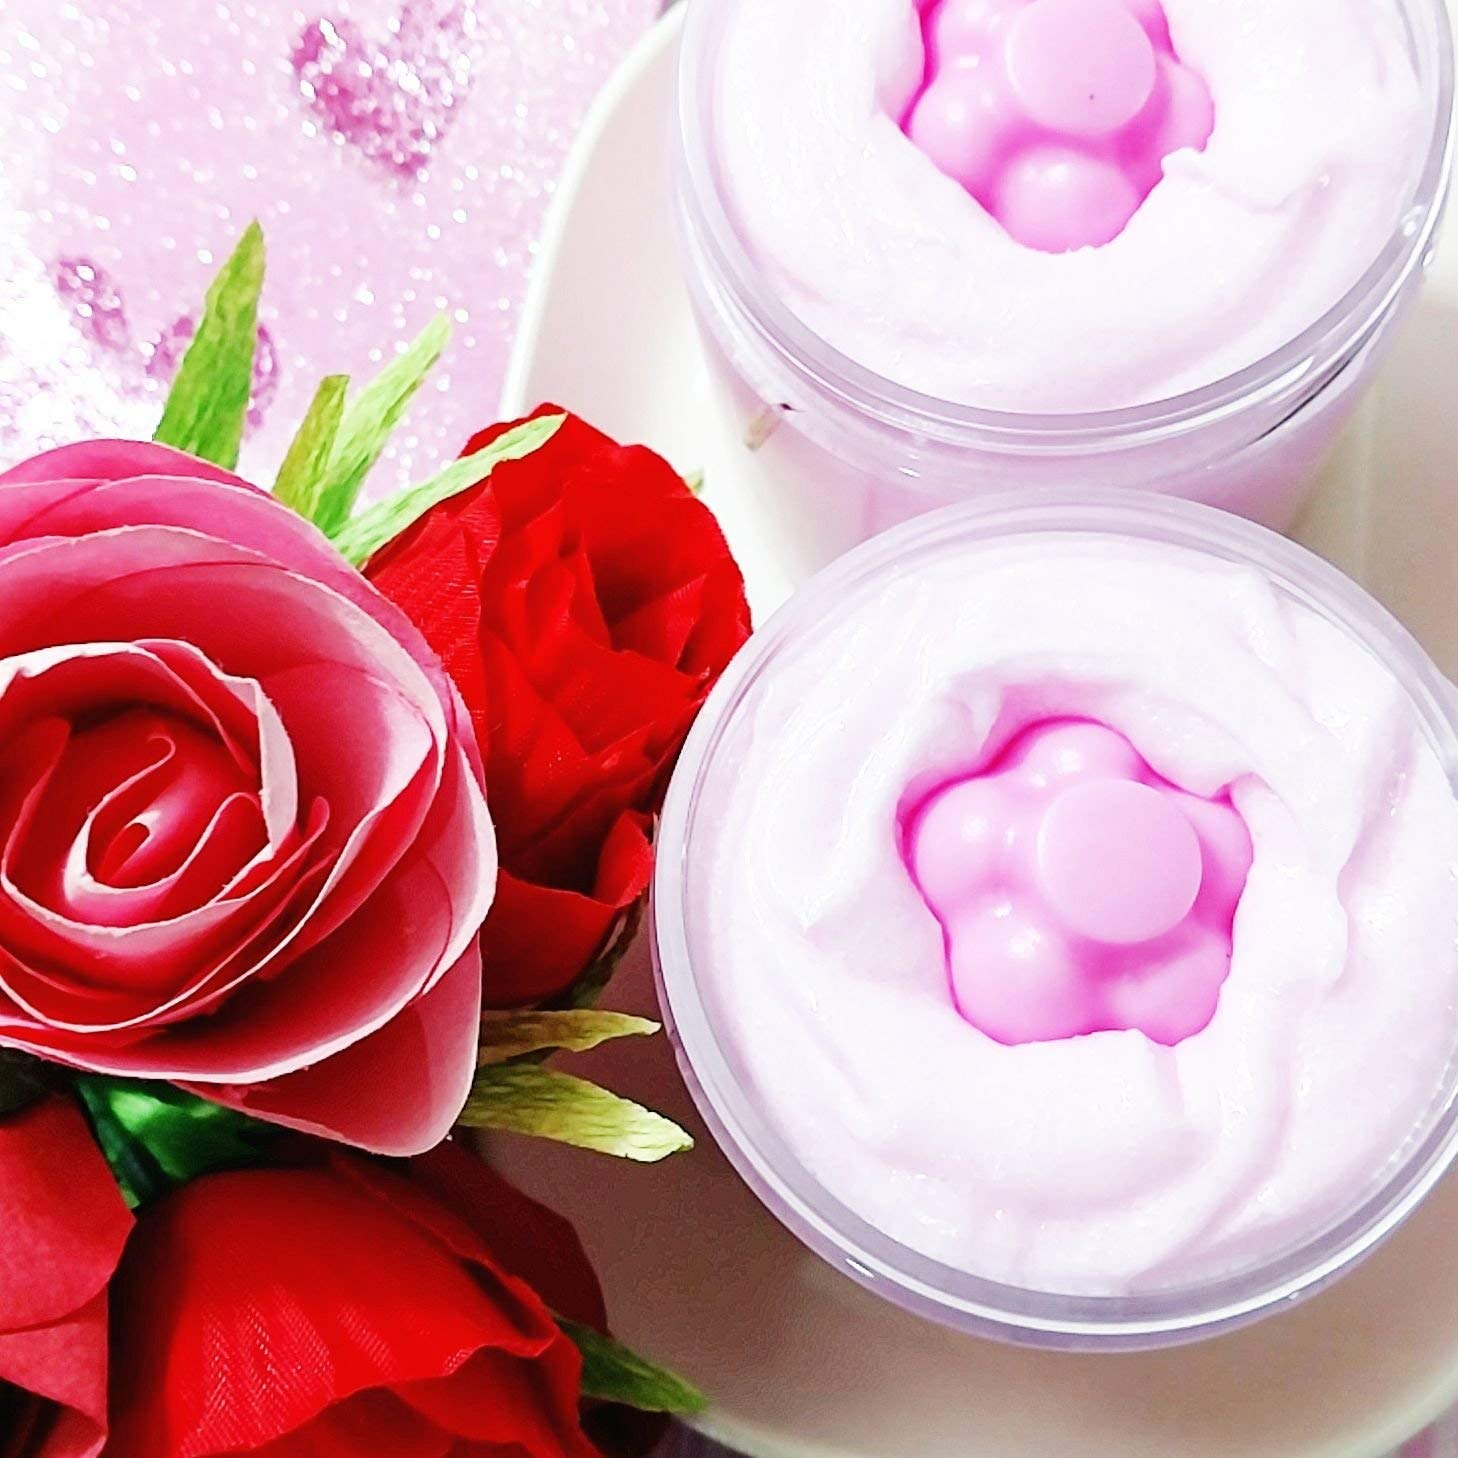 Romantic Rose Exfoliating Sugar Scrub Soap Birthday Gifts For Women Bridesmaid Proposal